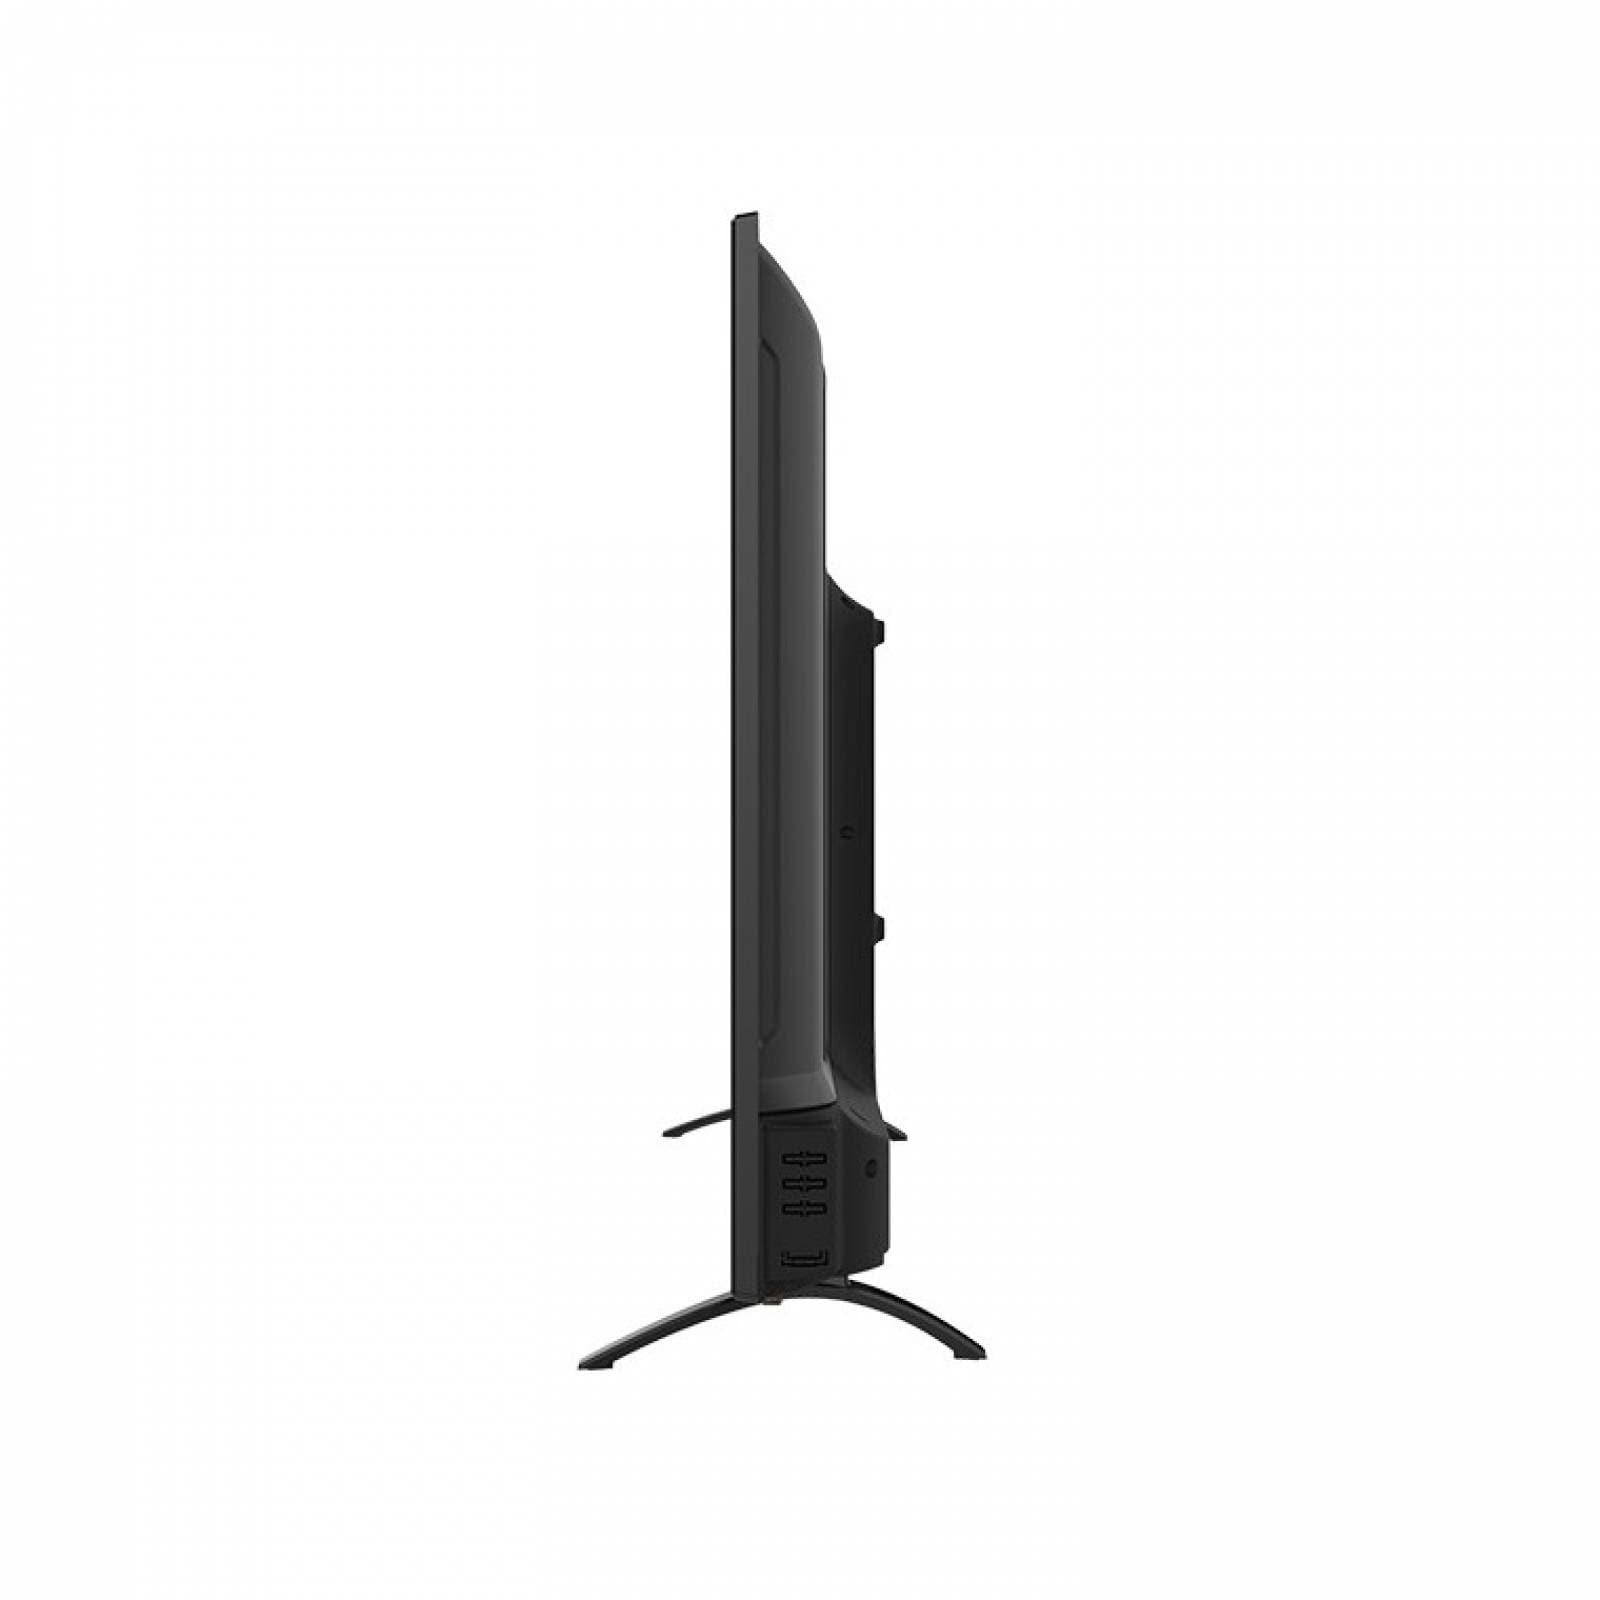 Smart TV Sansui 43 Pulgadas SO Android HDMI SMX4319USM